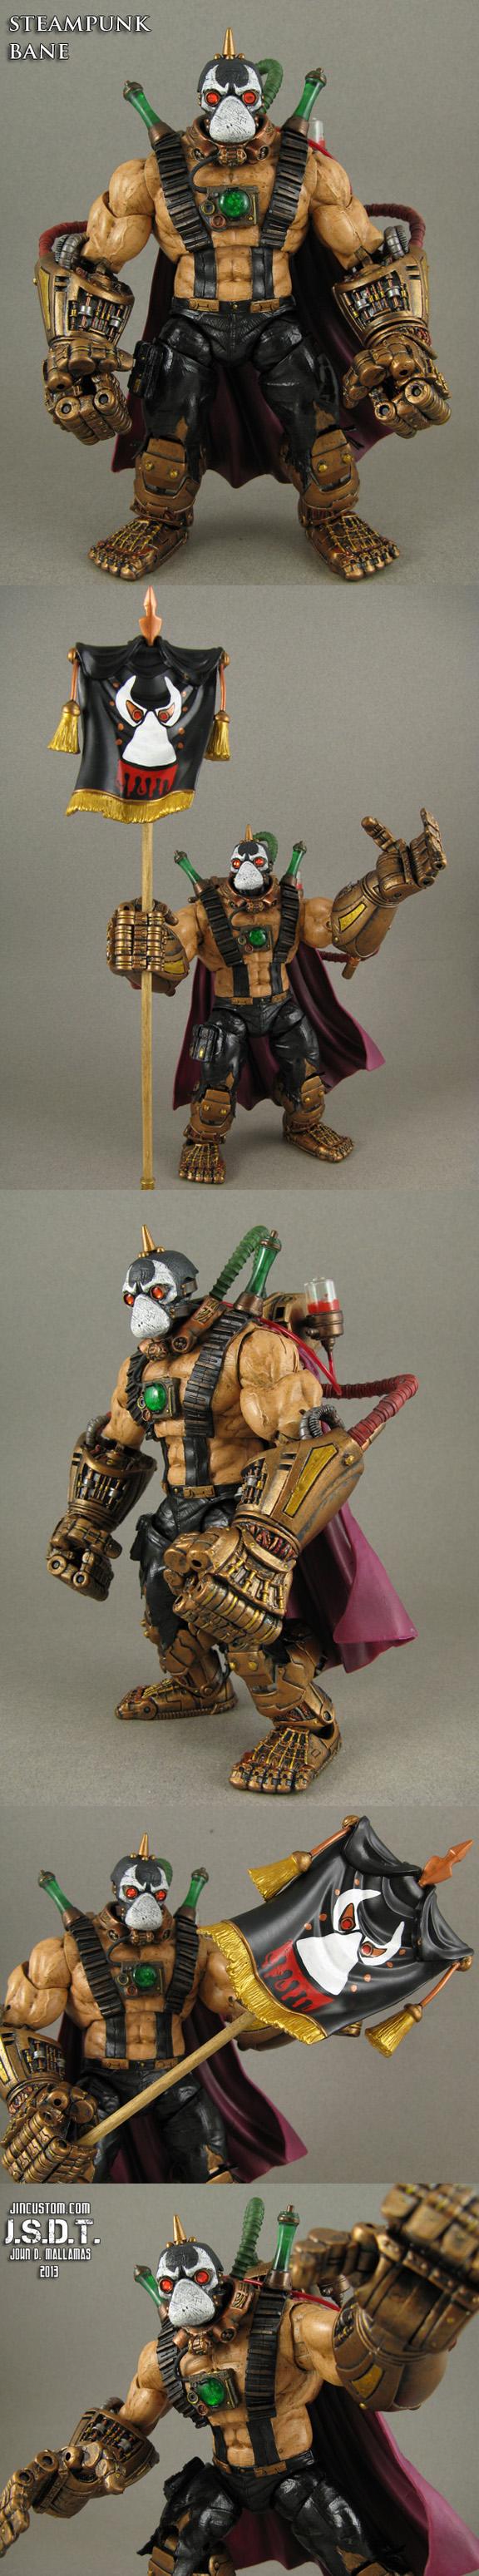 Custom Steampunk Bane DC Universe figure by Jin-Saotome